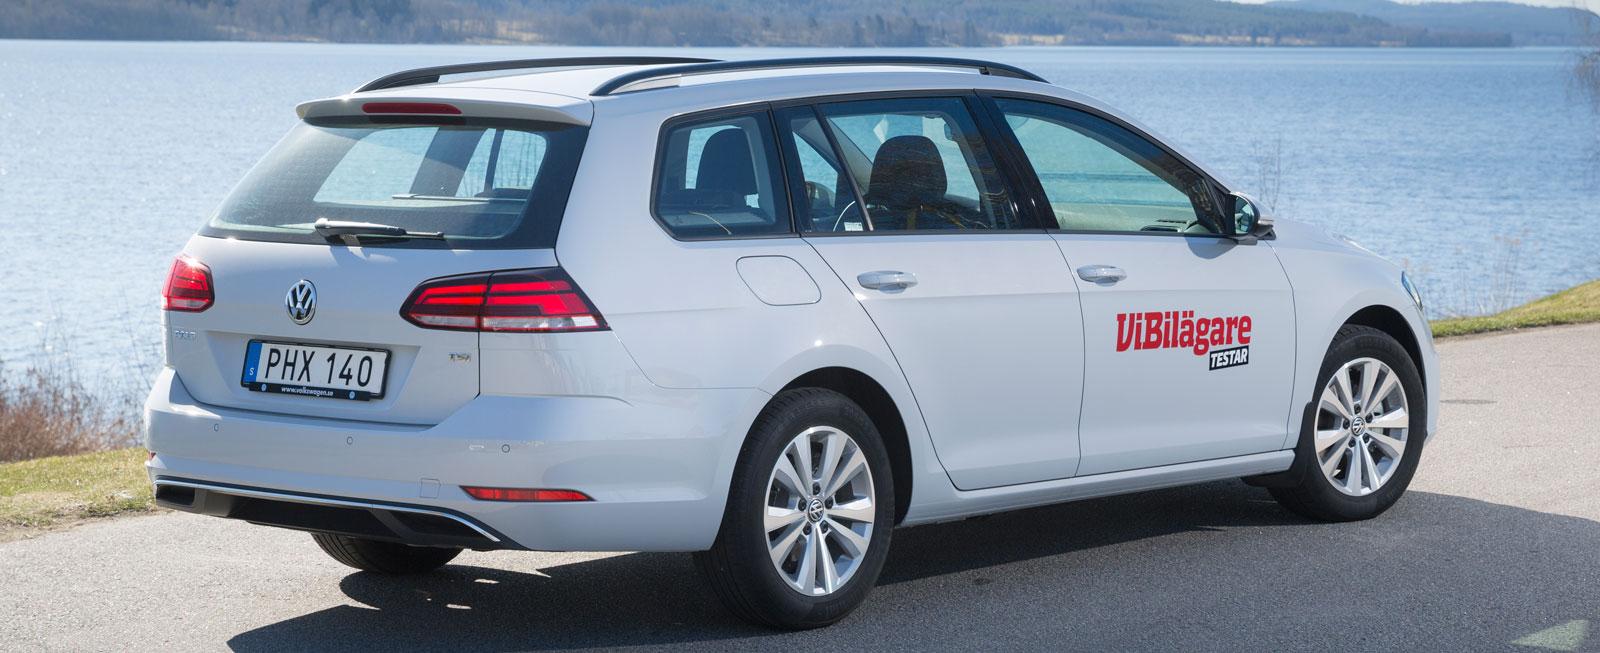 Volkswagen Golf Sportscombi 1.0 TSI/110 hk